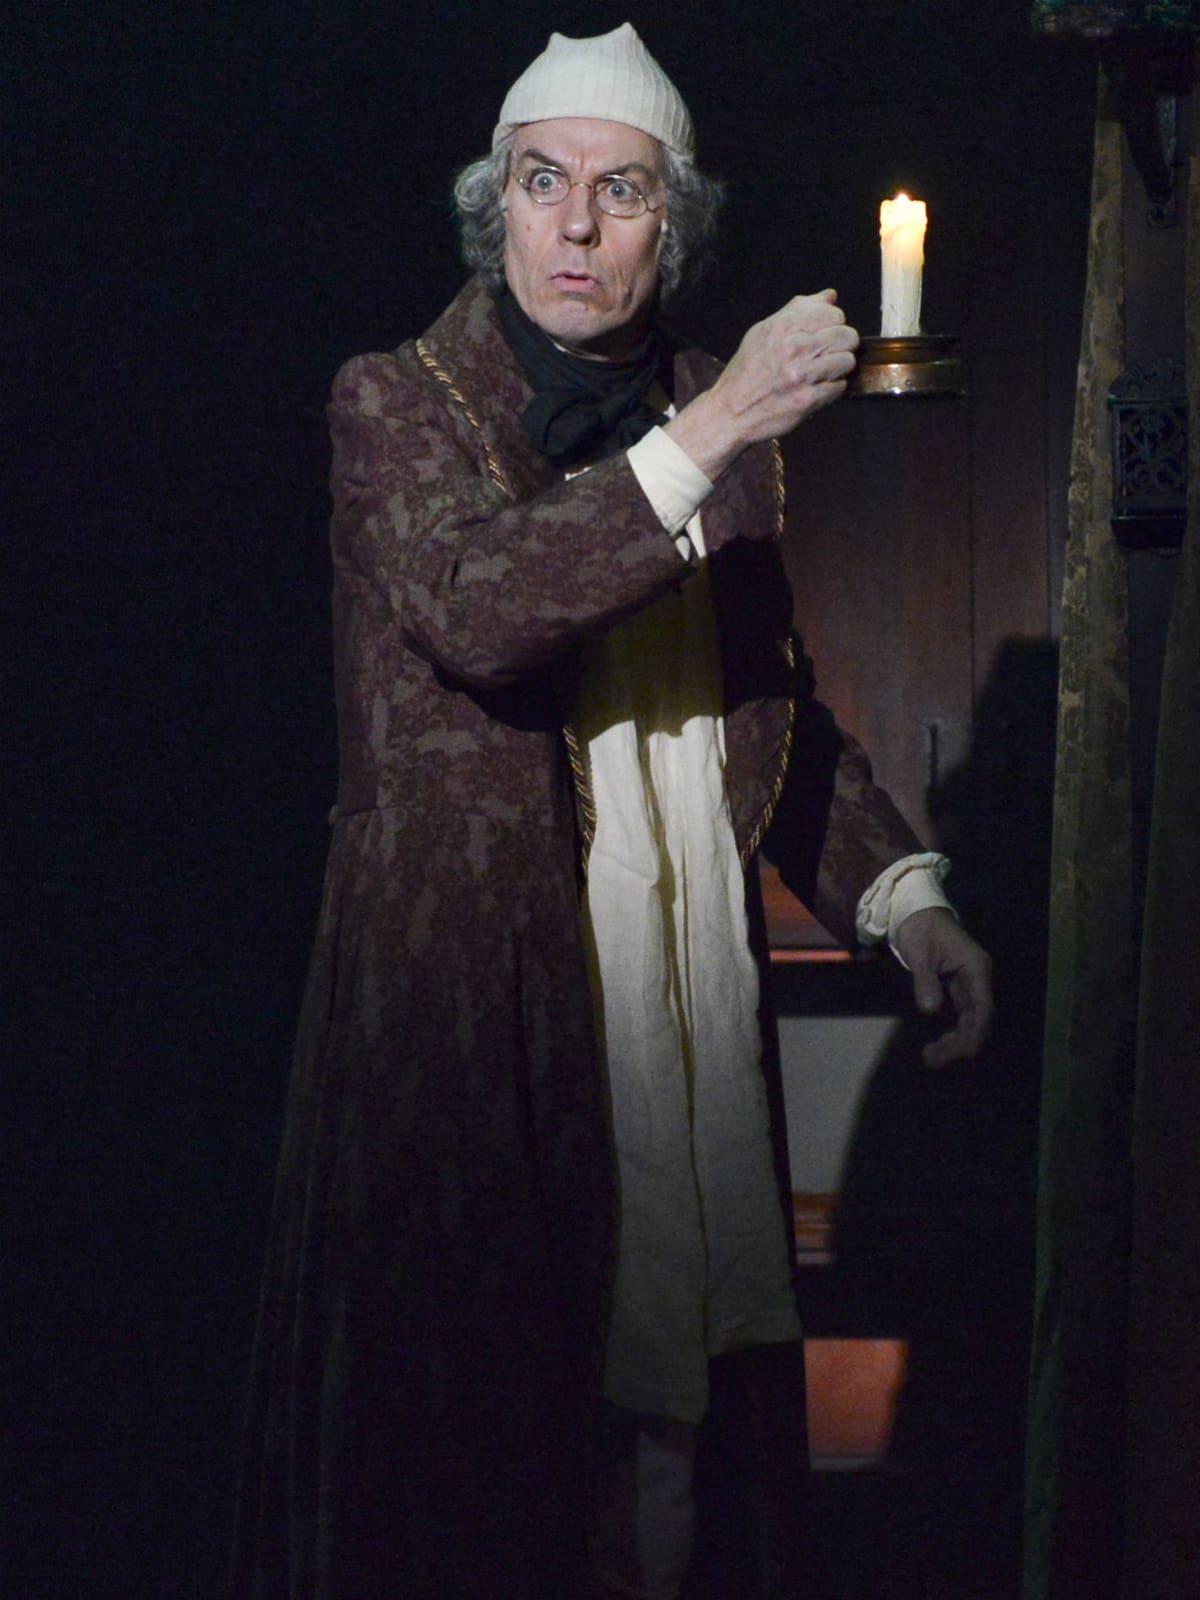 Chamblee Ferguson in Dallas Theater Center's A Christmas Carol